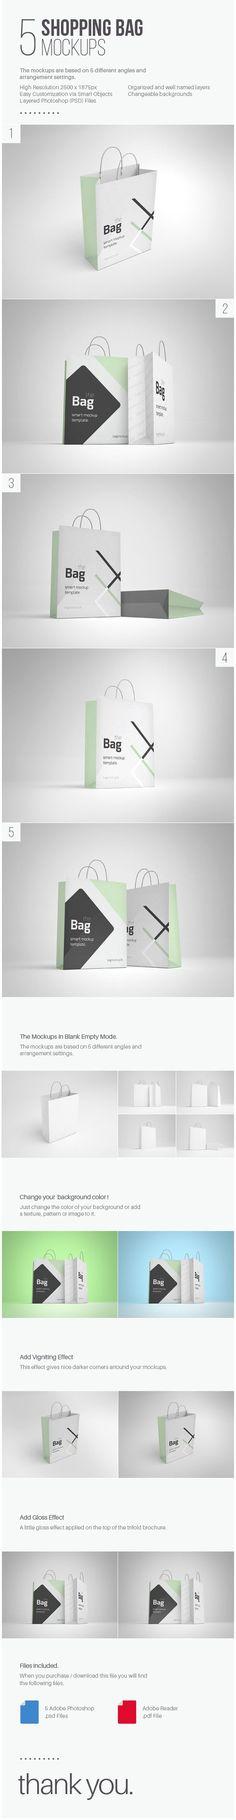 Free Bag Mockup (Psd) on Behance